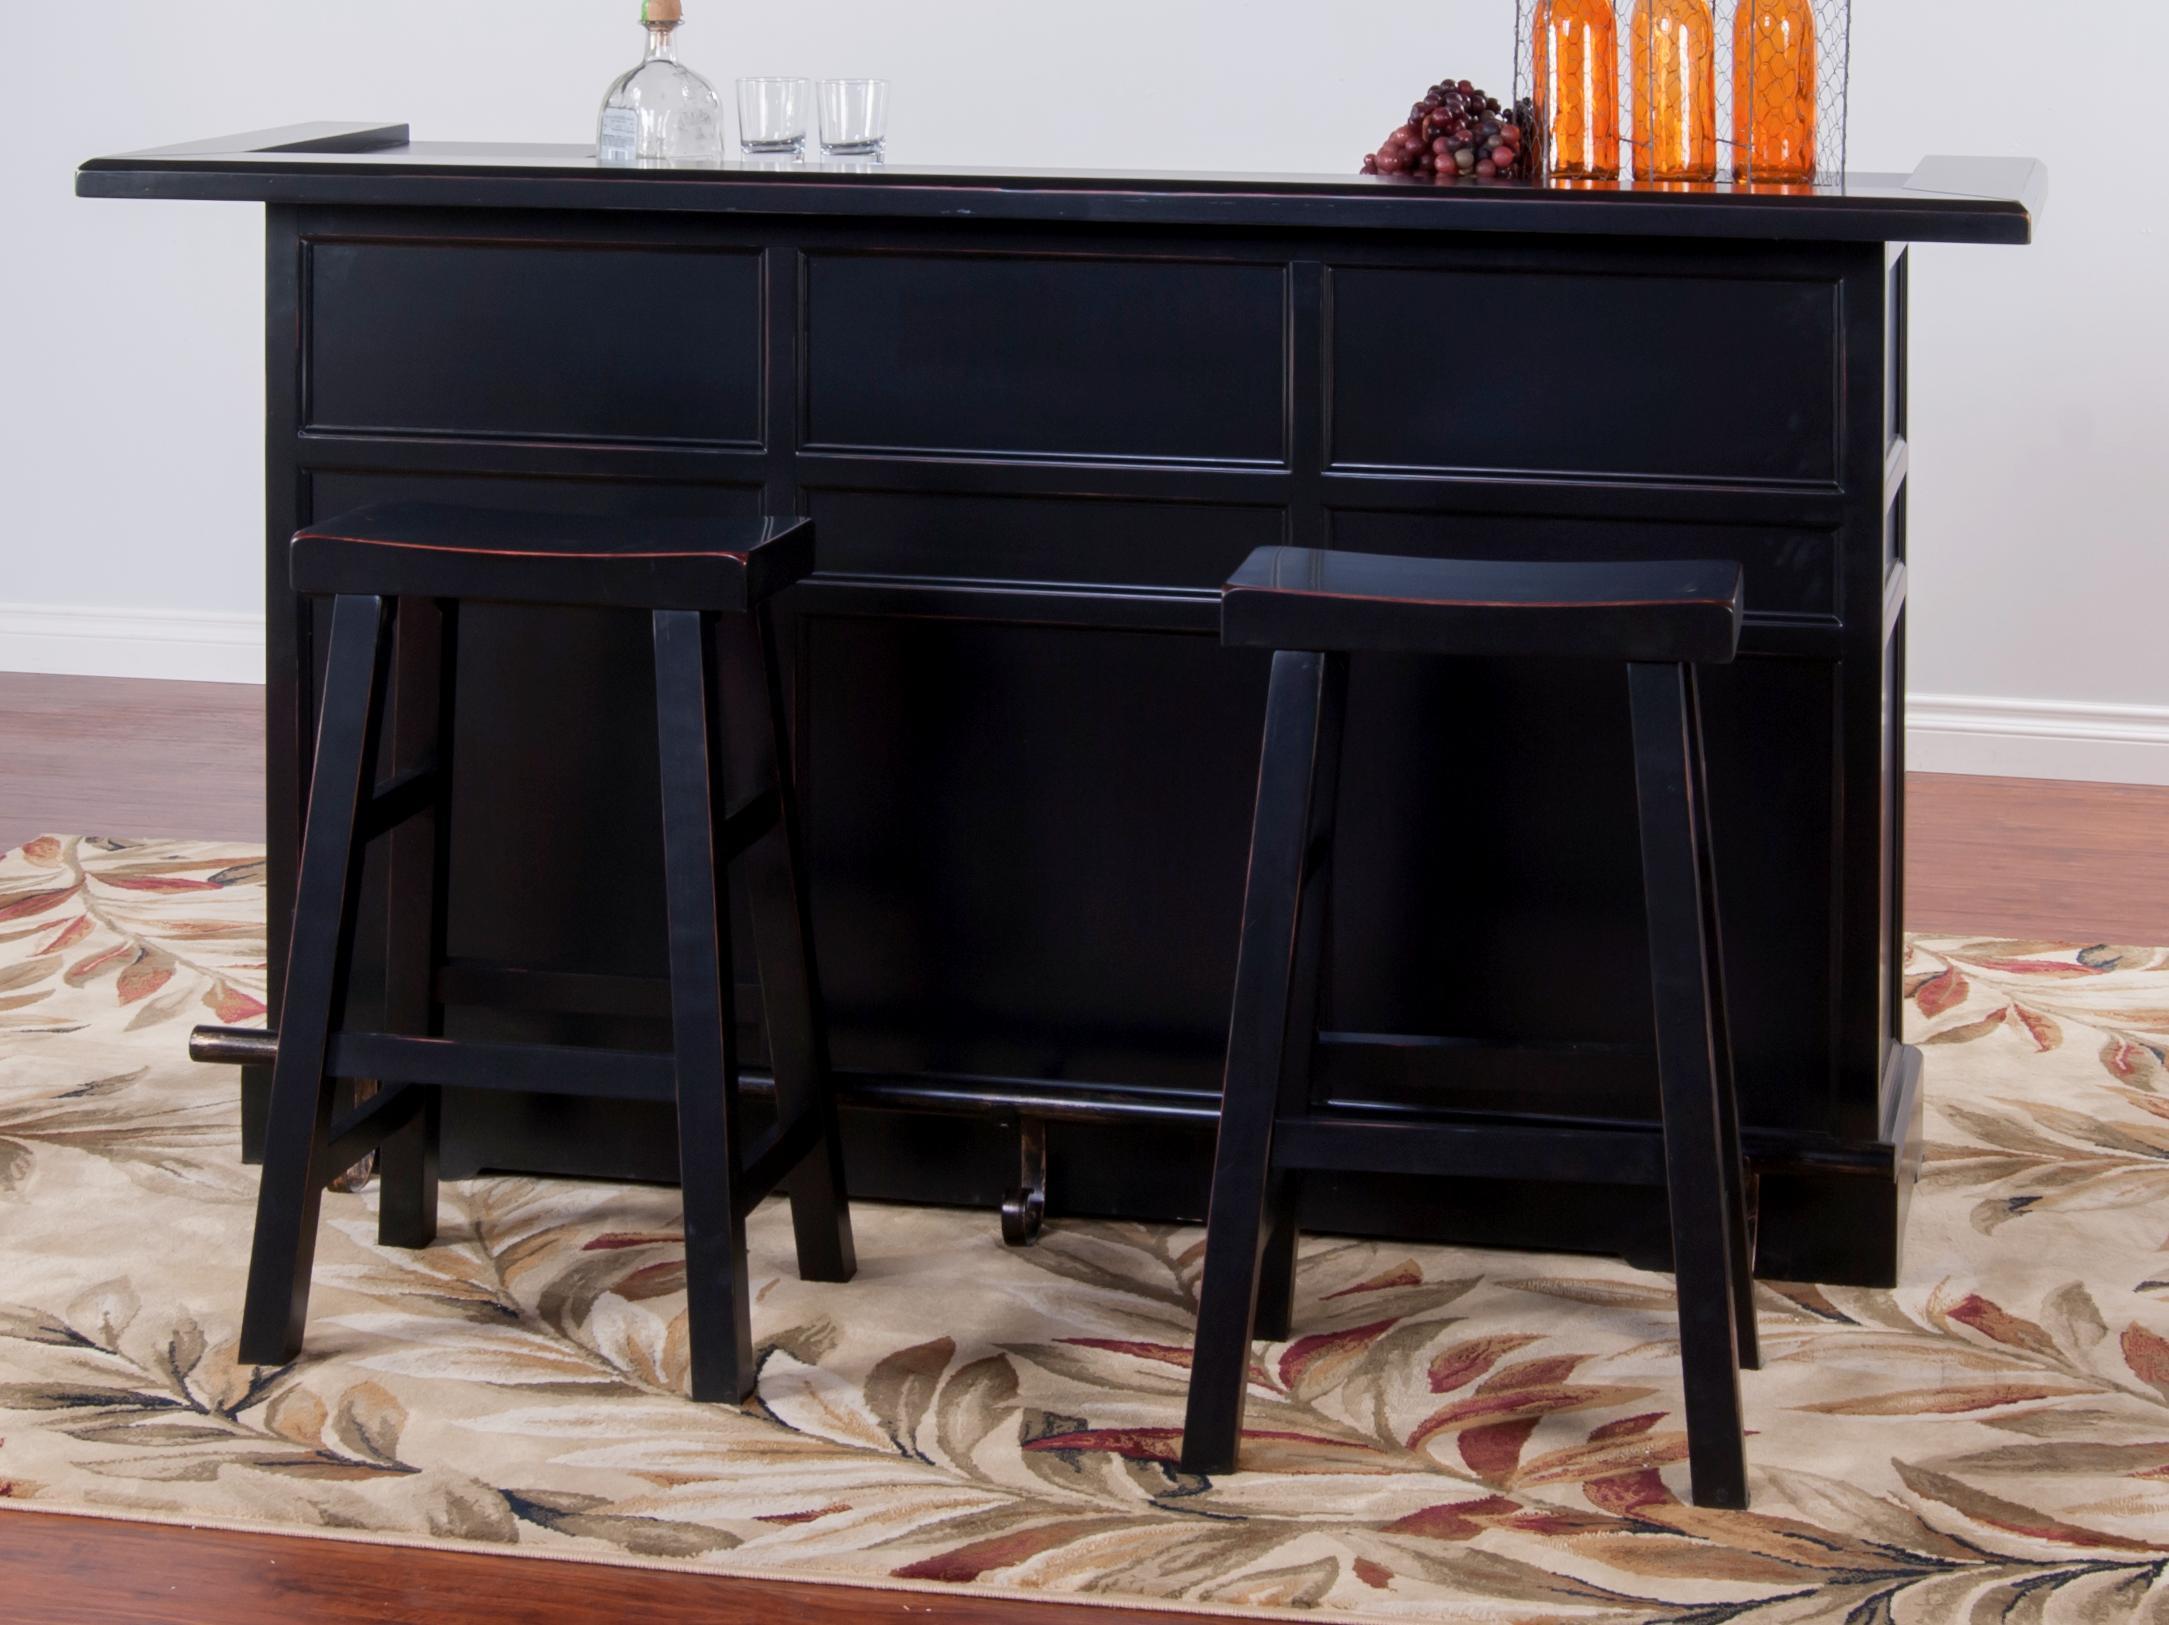 Morris Home Furnishings Vandalia Vandalia 3-Piece Bar Set - Item Number: 2575VB-T/B/1769VB(4)